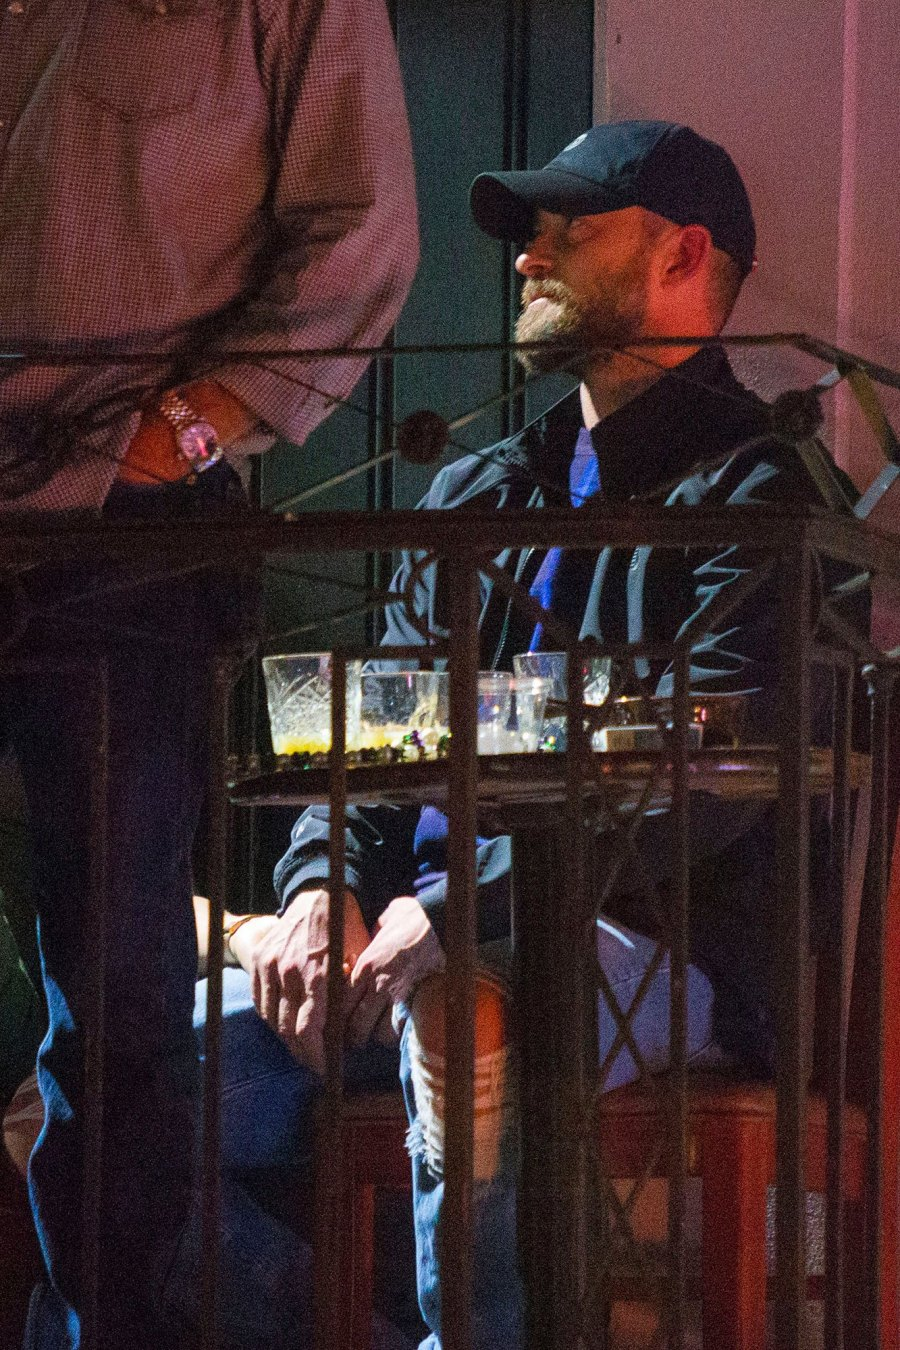 Pics of Justin Timberlake Holding Hands With Costar Alisha Wainwright